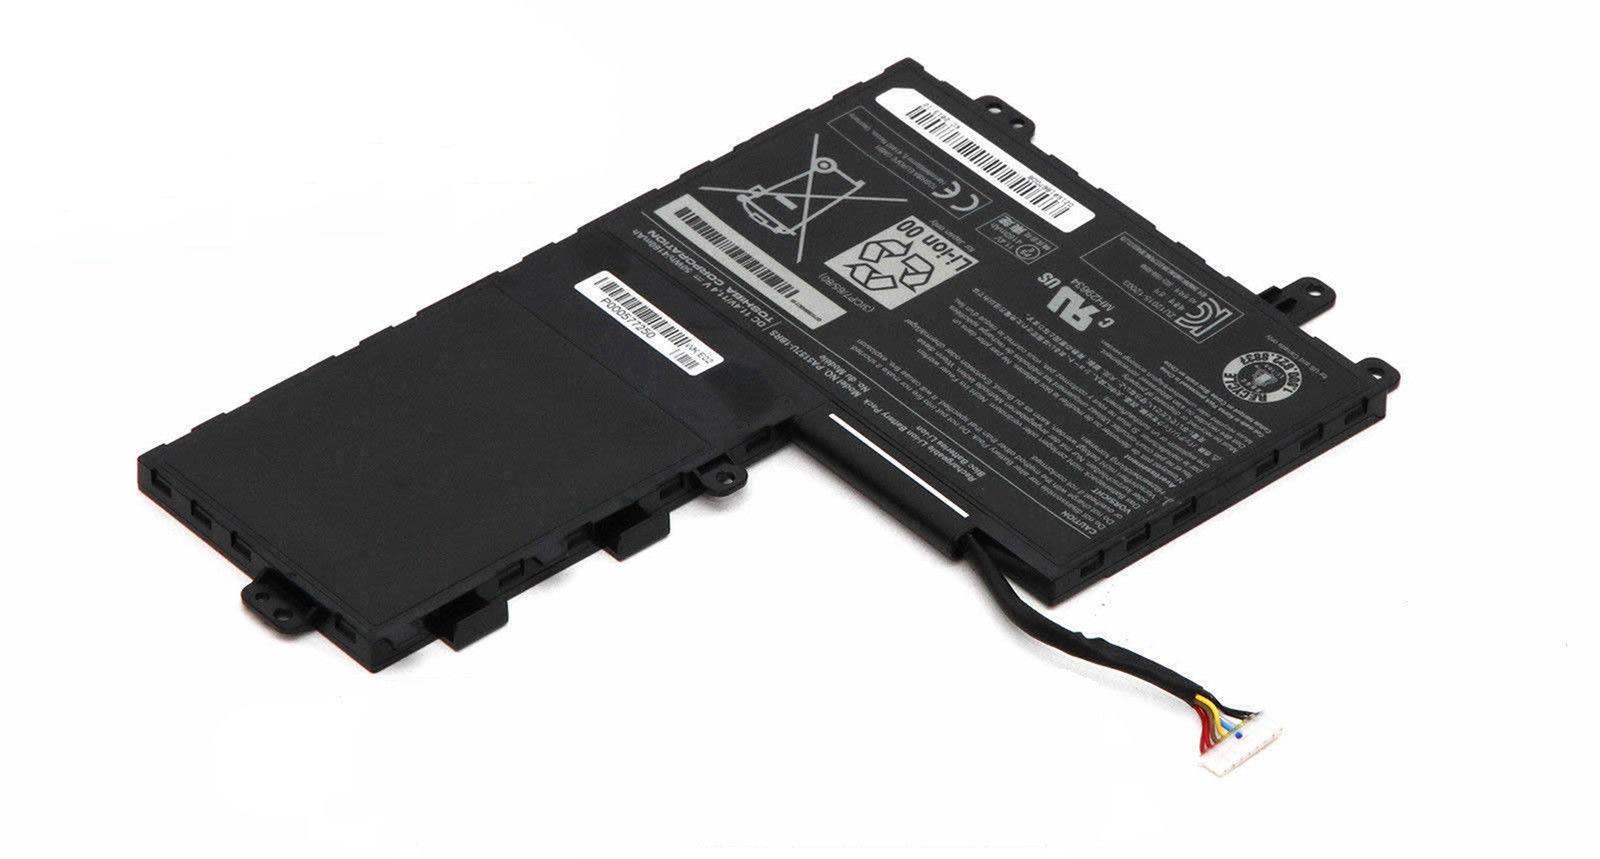 Akku für Toshiba Satellite E45T E45T-A4100 E55t-A(Ersatz)